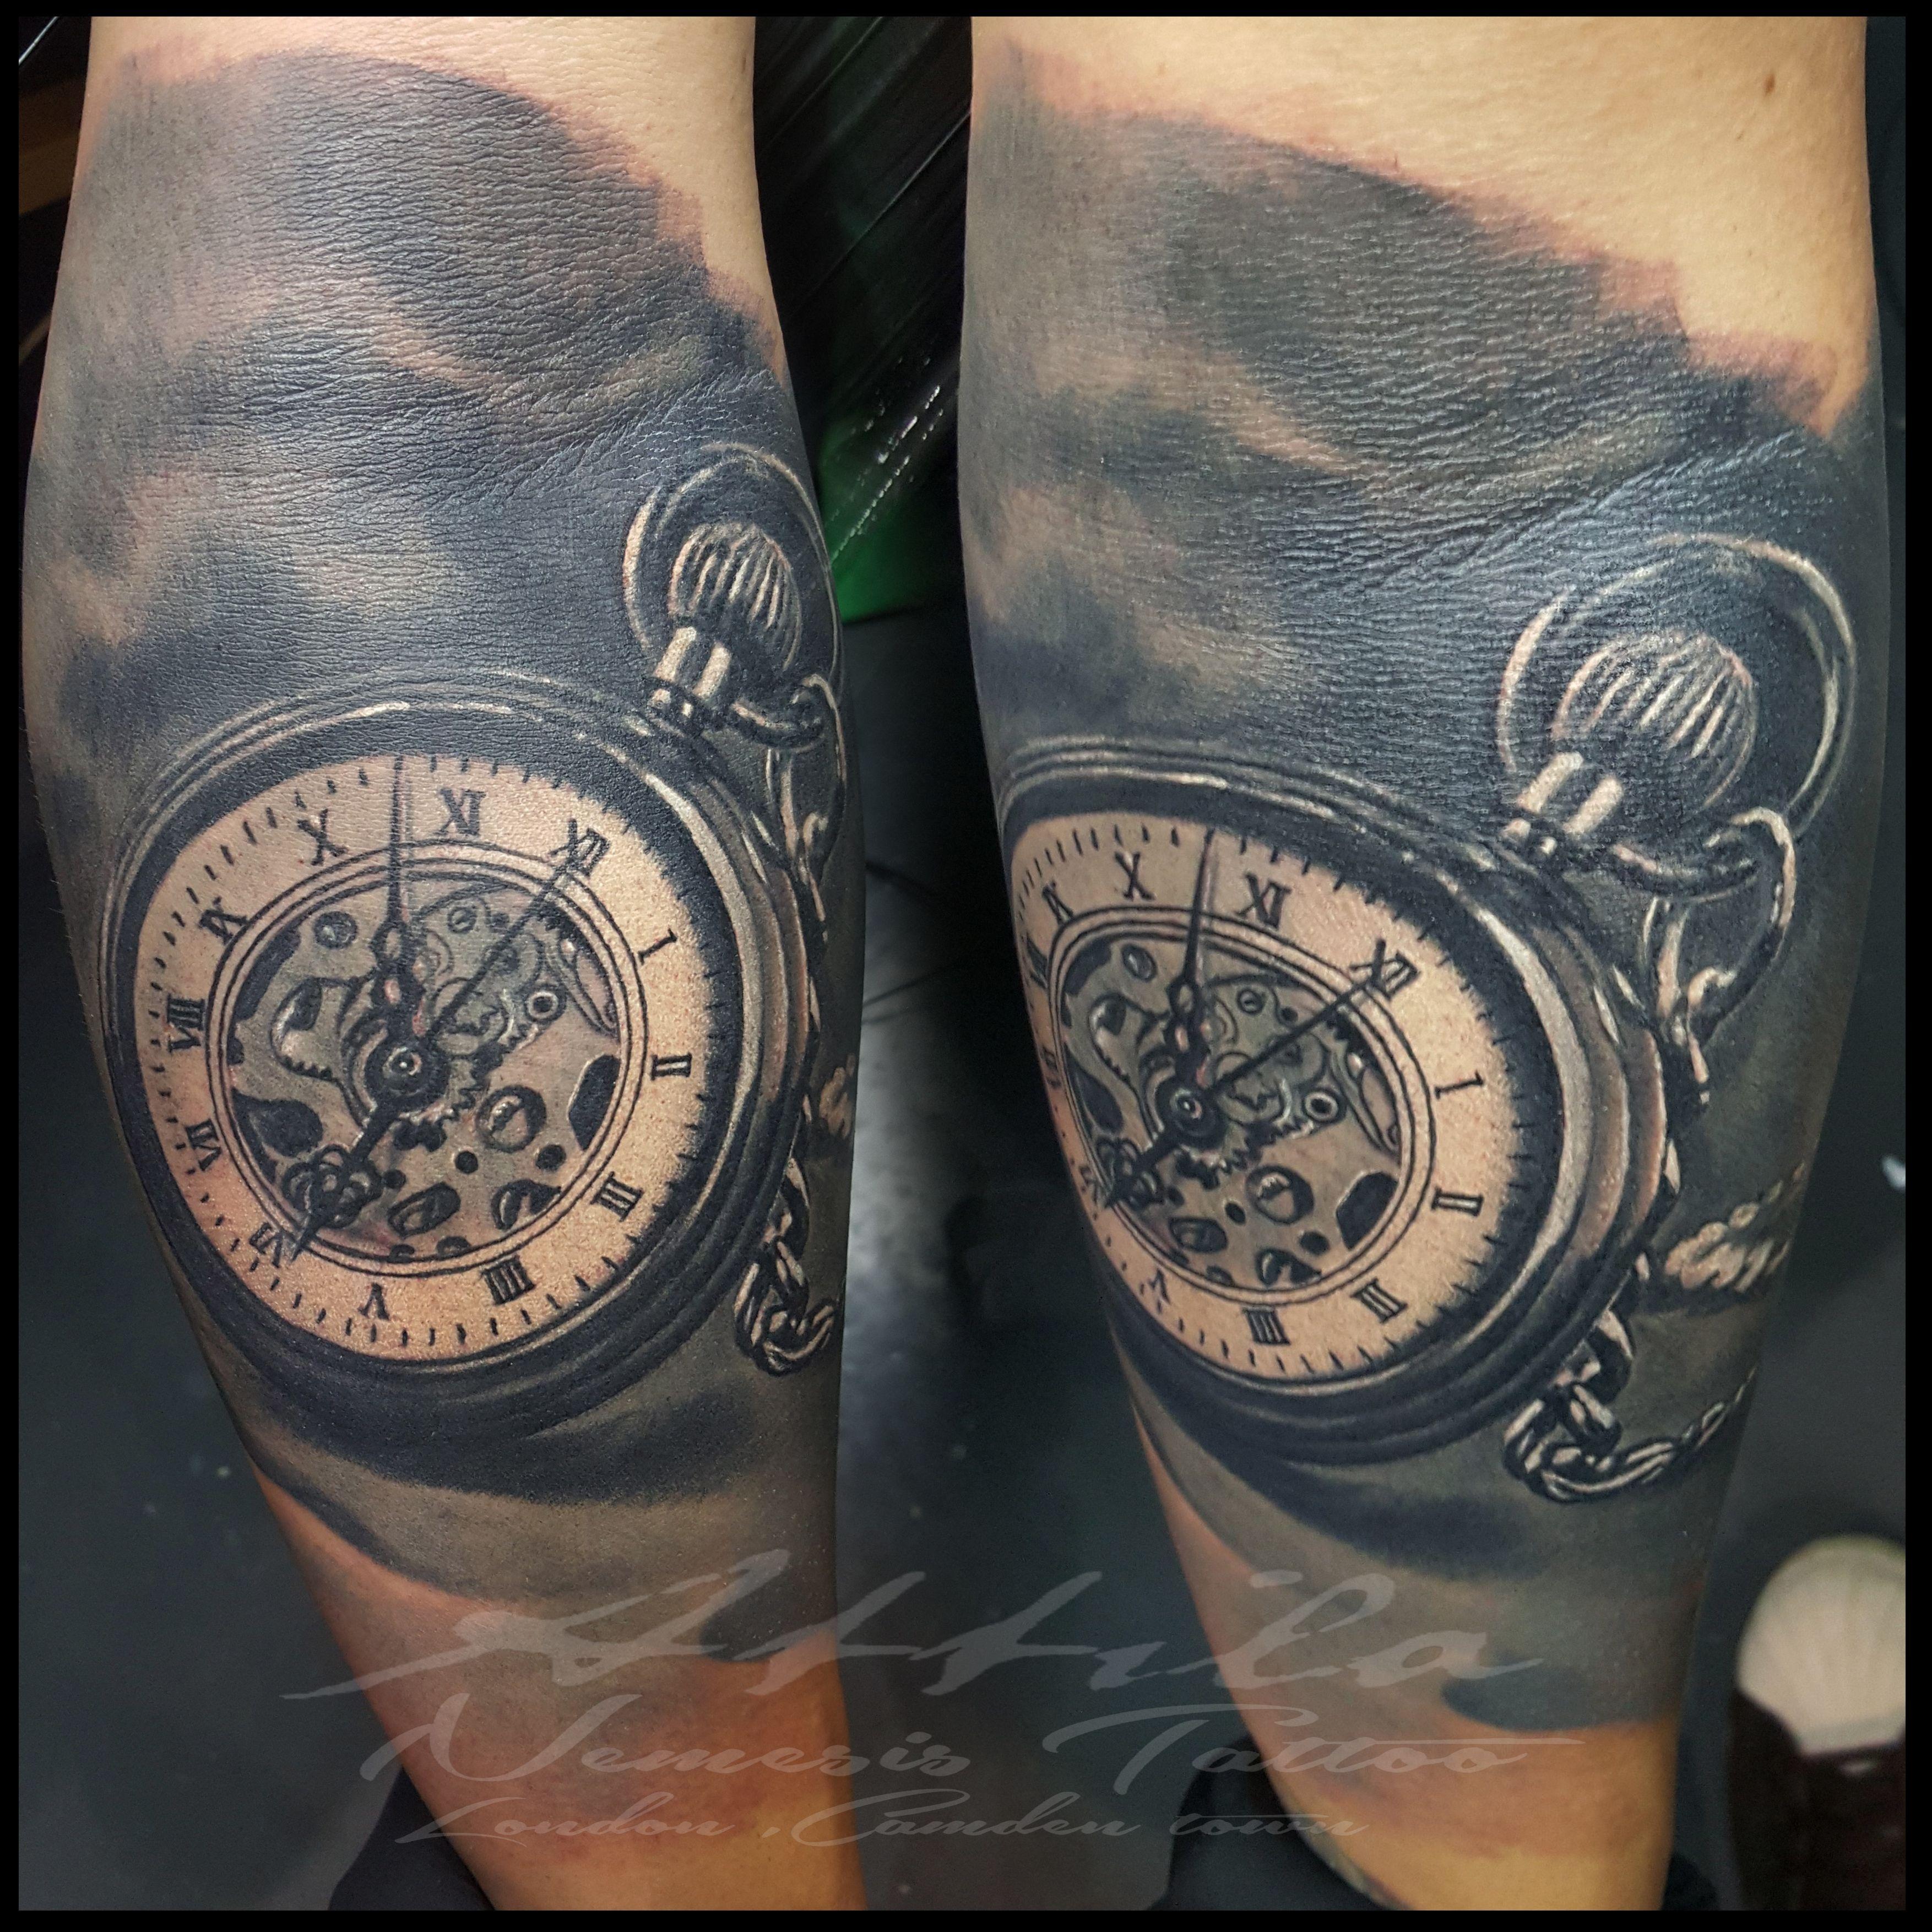 pocket watch tattoo tattoos pinterest. Black Bedroom Furniture Sets. Home Design Ideas